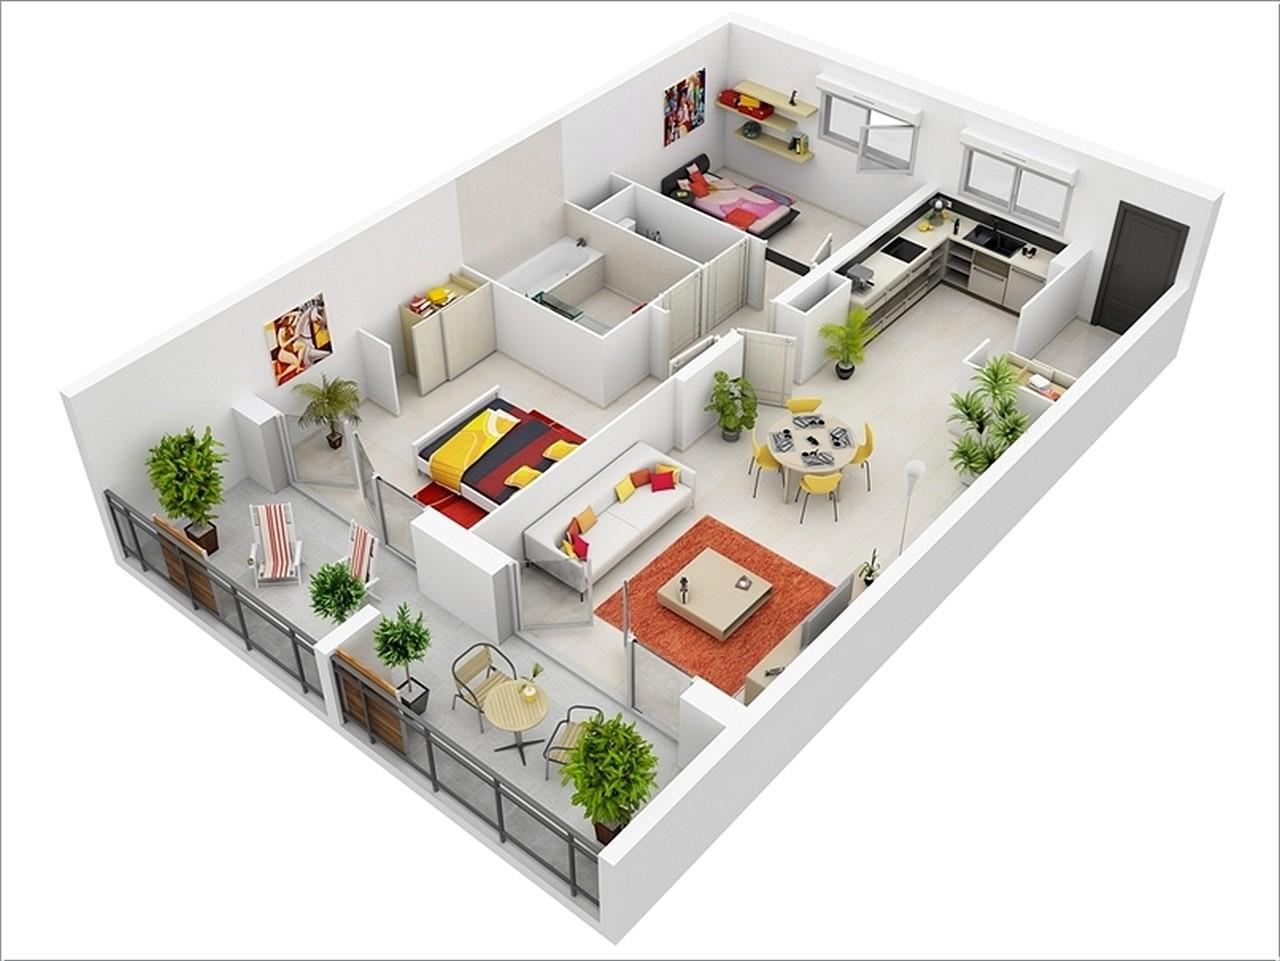 Sketsa Denah Rumah Minimalis Sederhana 2 Kamar Tidur Terbaru